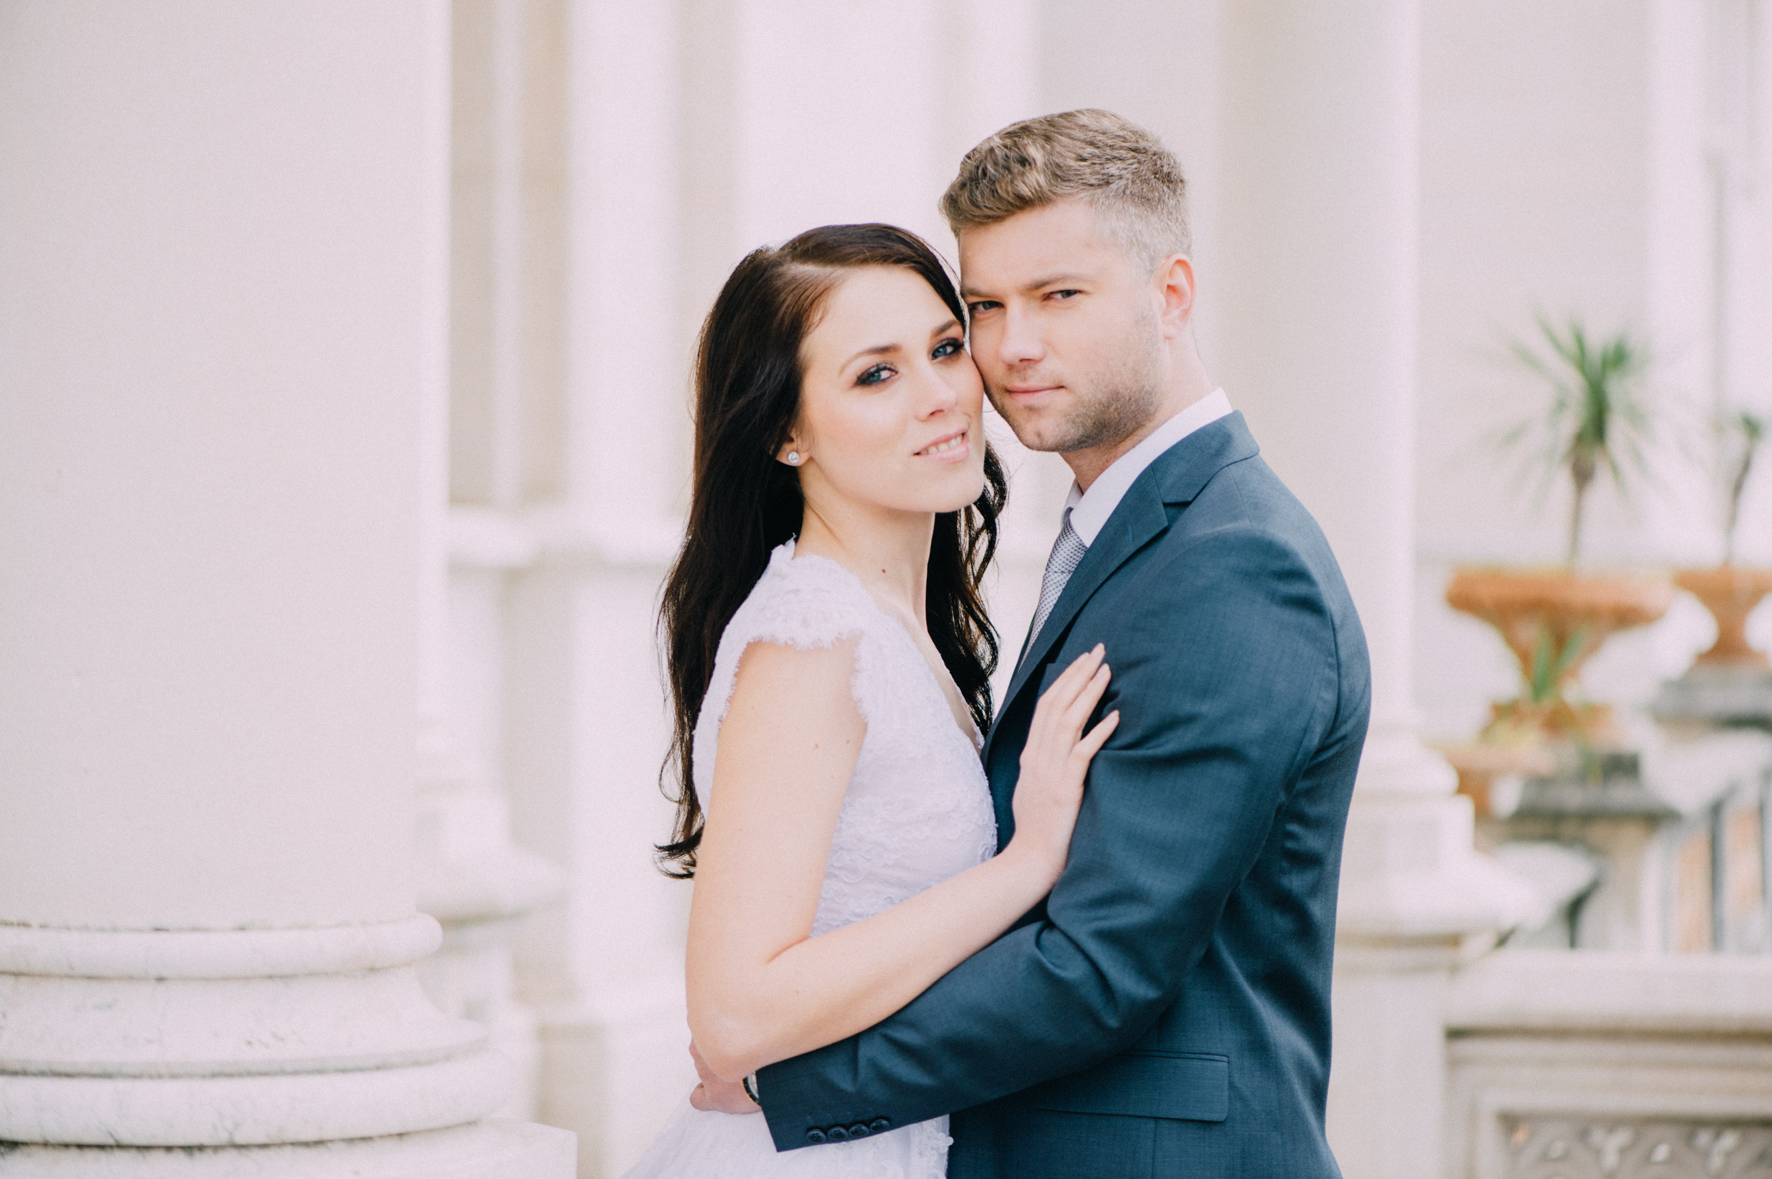 wedding_italy_ladiesandlord-0057